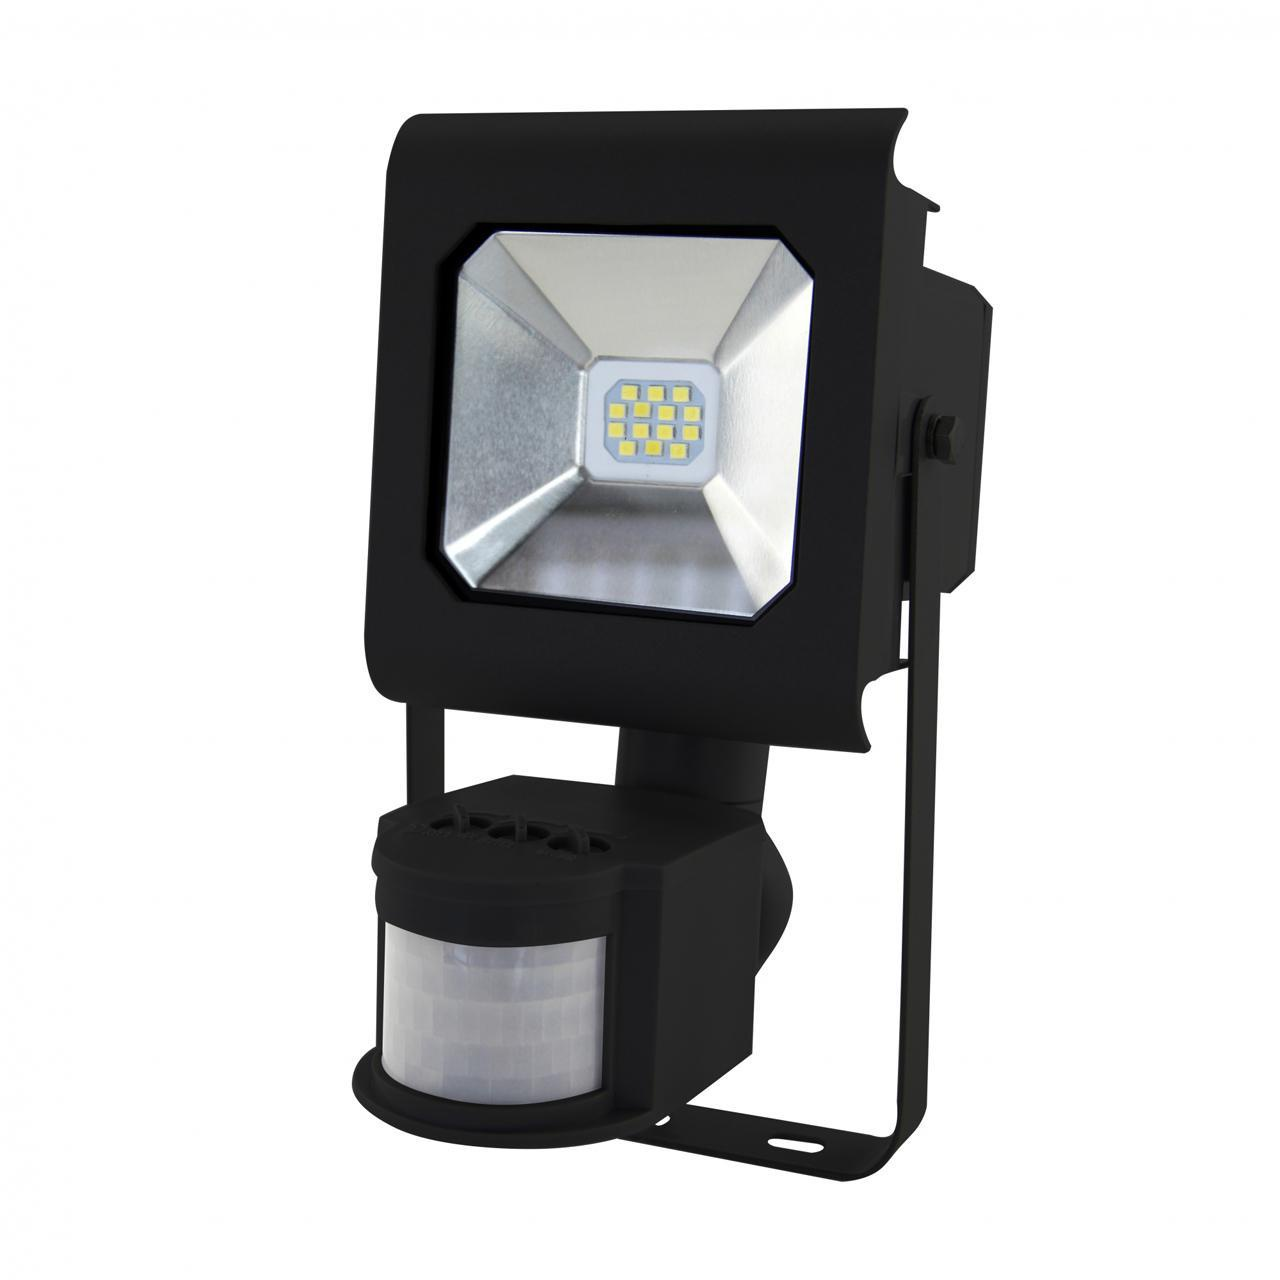 Прожектор Эра LPR-10-2700K-M-SEN SMD PRO, 10 Вт аксессуар чехол zte blade a515 aksberry black